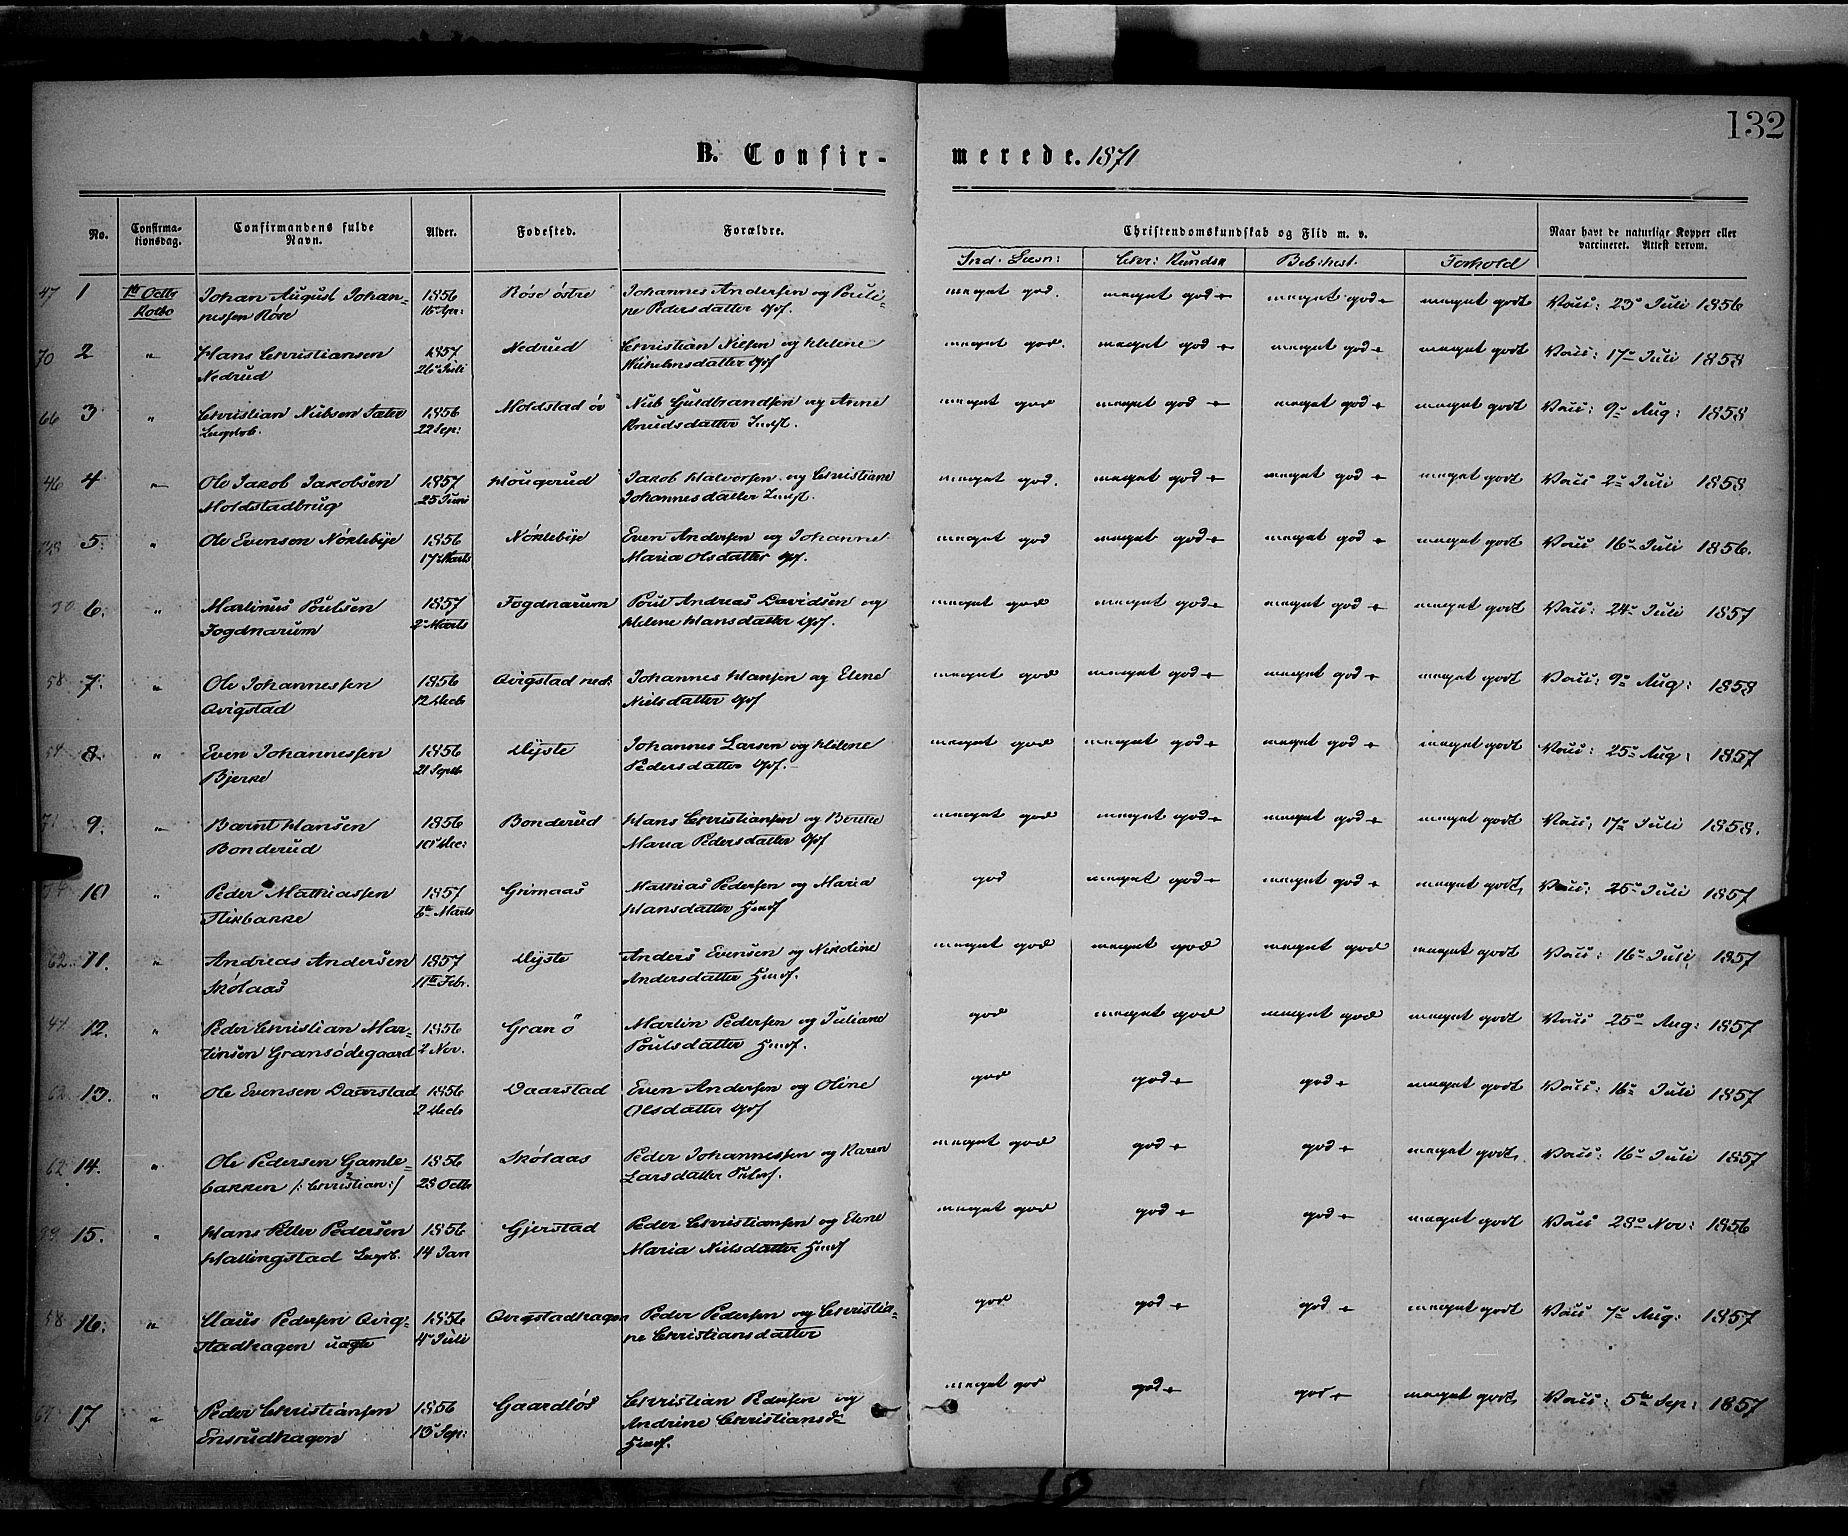 SAH, Vestre Toten prestekontor, H/Ha/Haa/L0008: Ministerialbok nr. 8, 1870-1877, s. 132